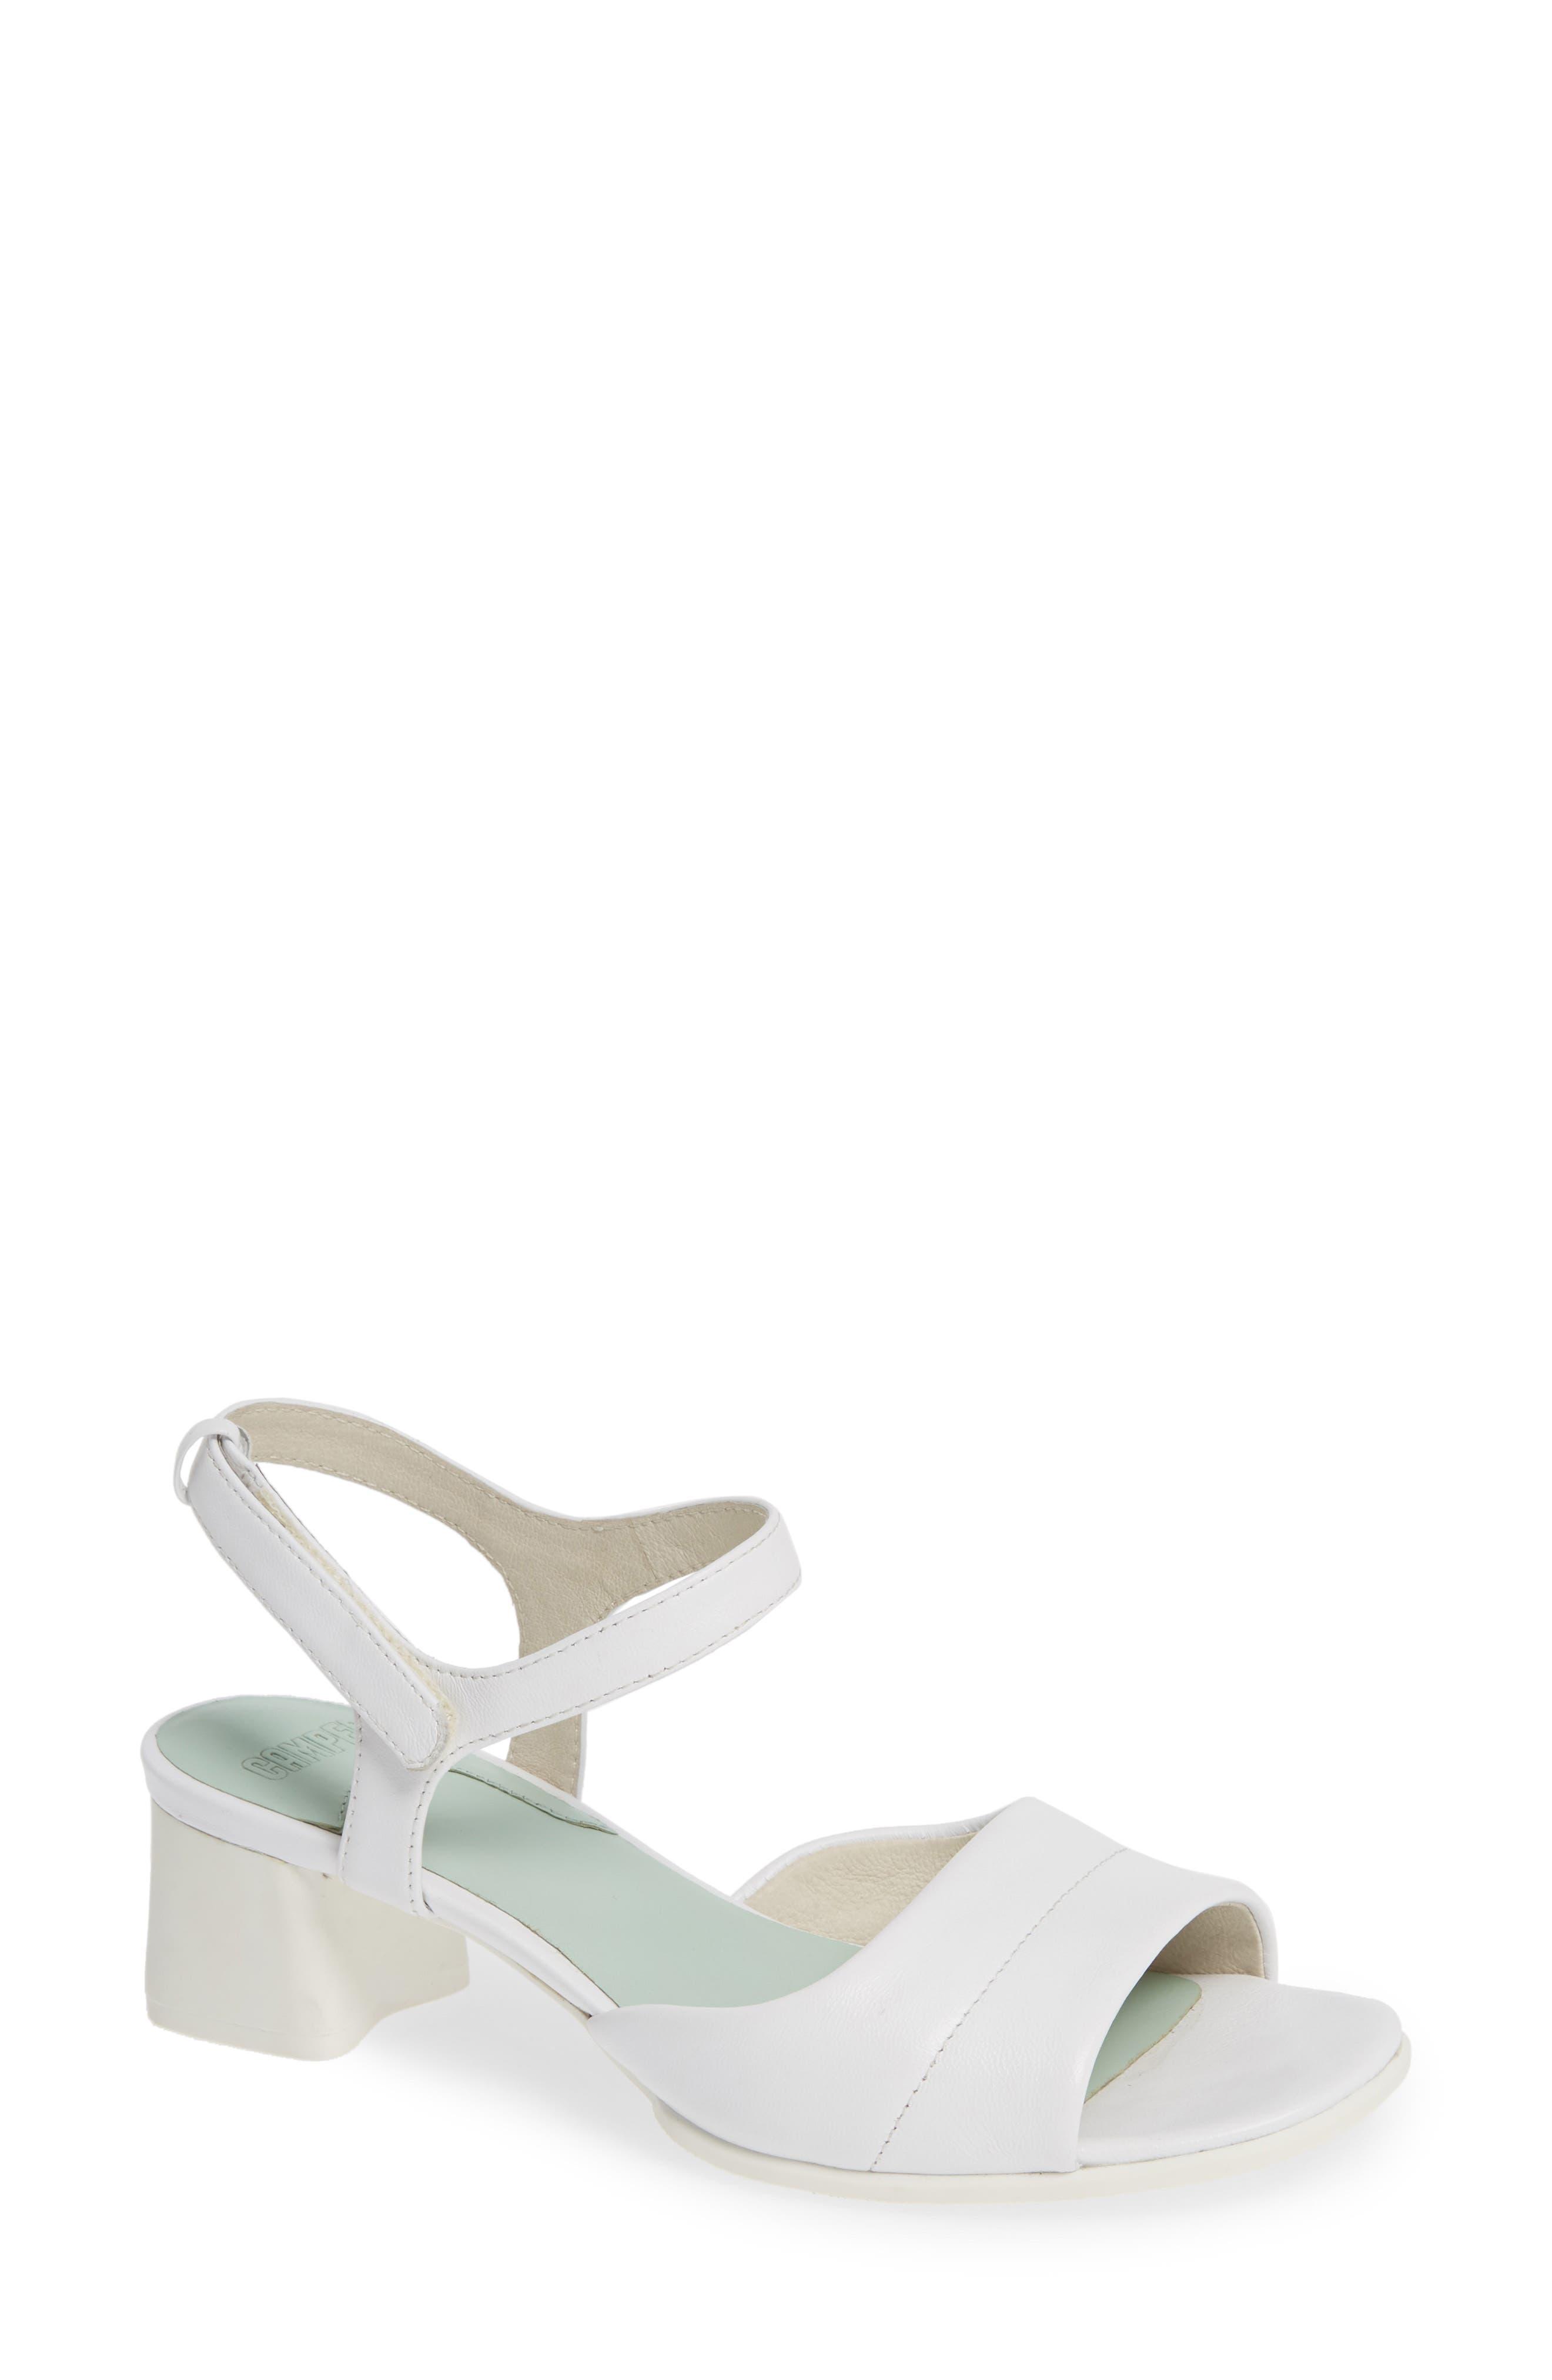 CAMPER Katie Block Heel Sandal, Main, color, WHITE NATURAL LEATHER